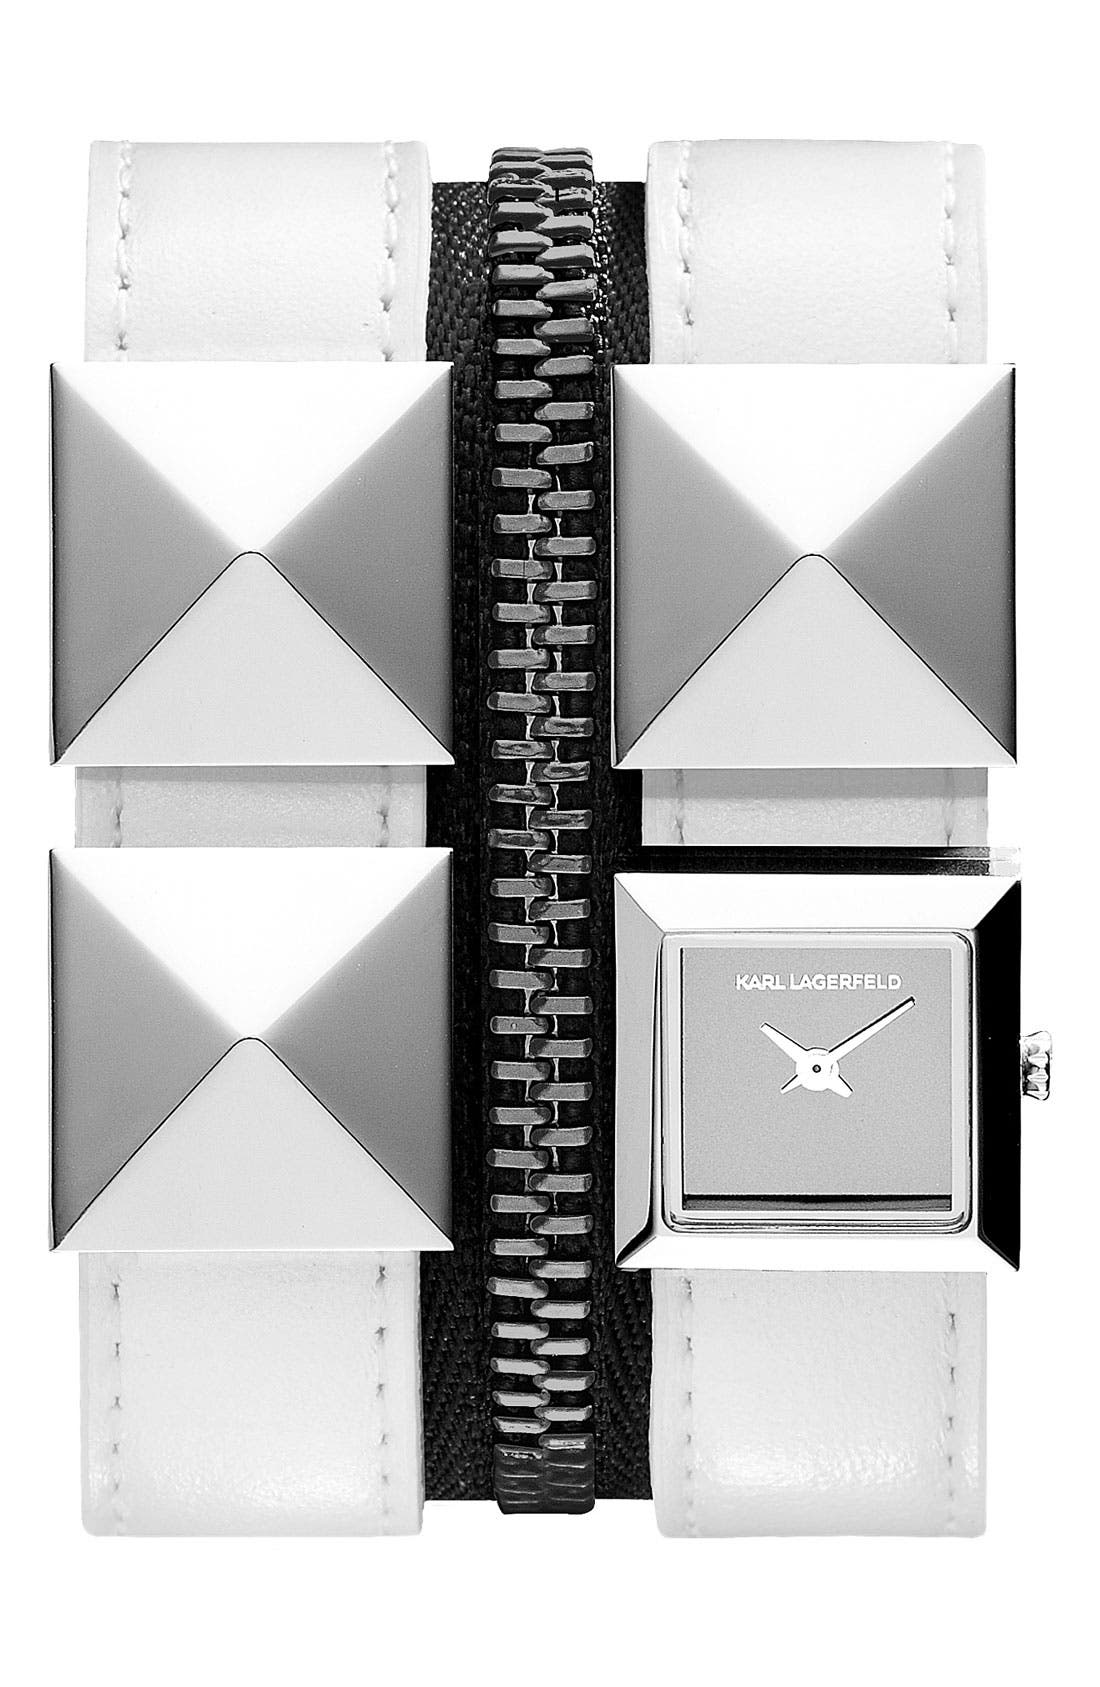 Main Image - KARL LAGERFELD Double Strap Cuff Watch, 17mm